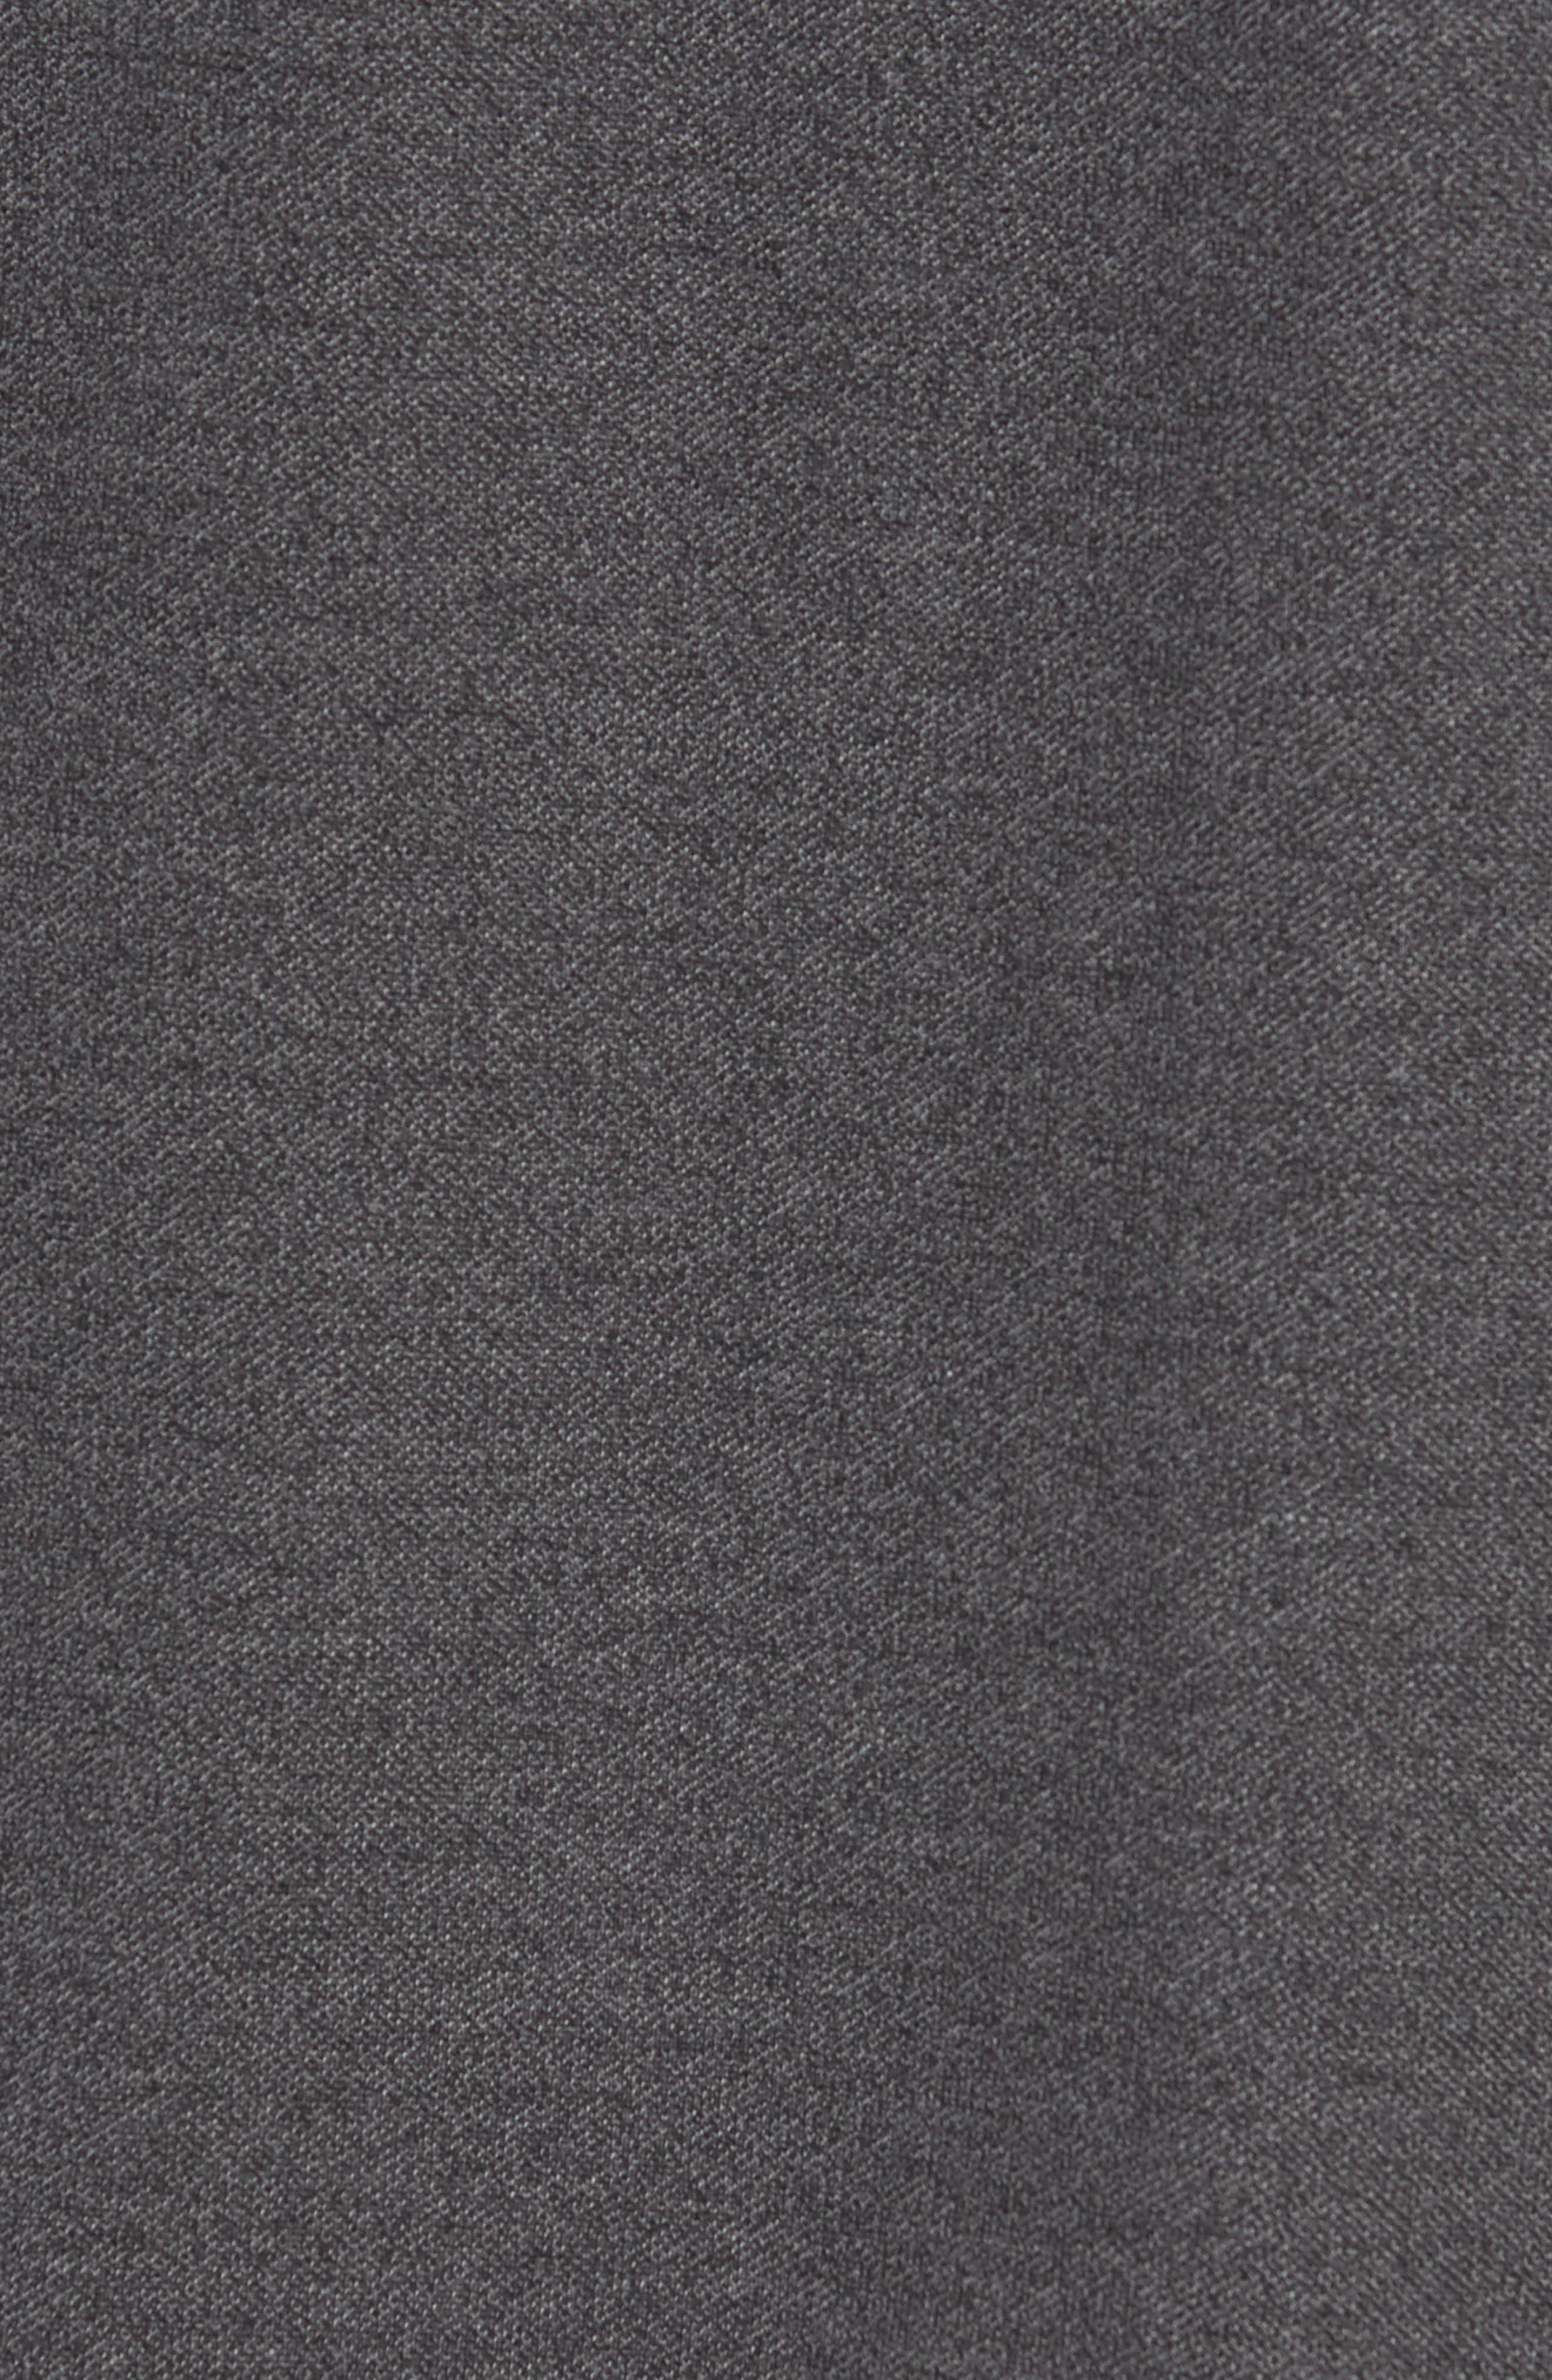 Regular Fit Polo,                             Alternate thumbnail 5, color,                             Black Caviar Melange